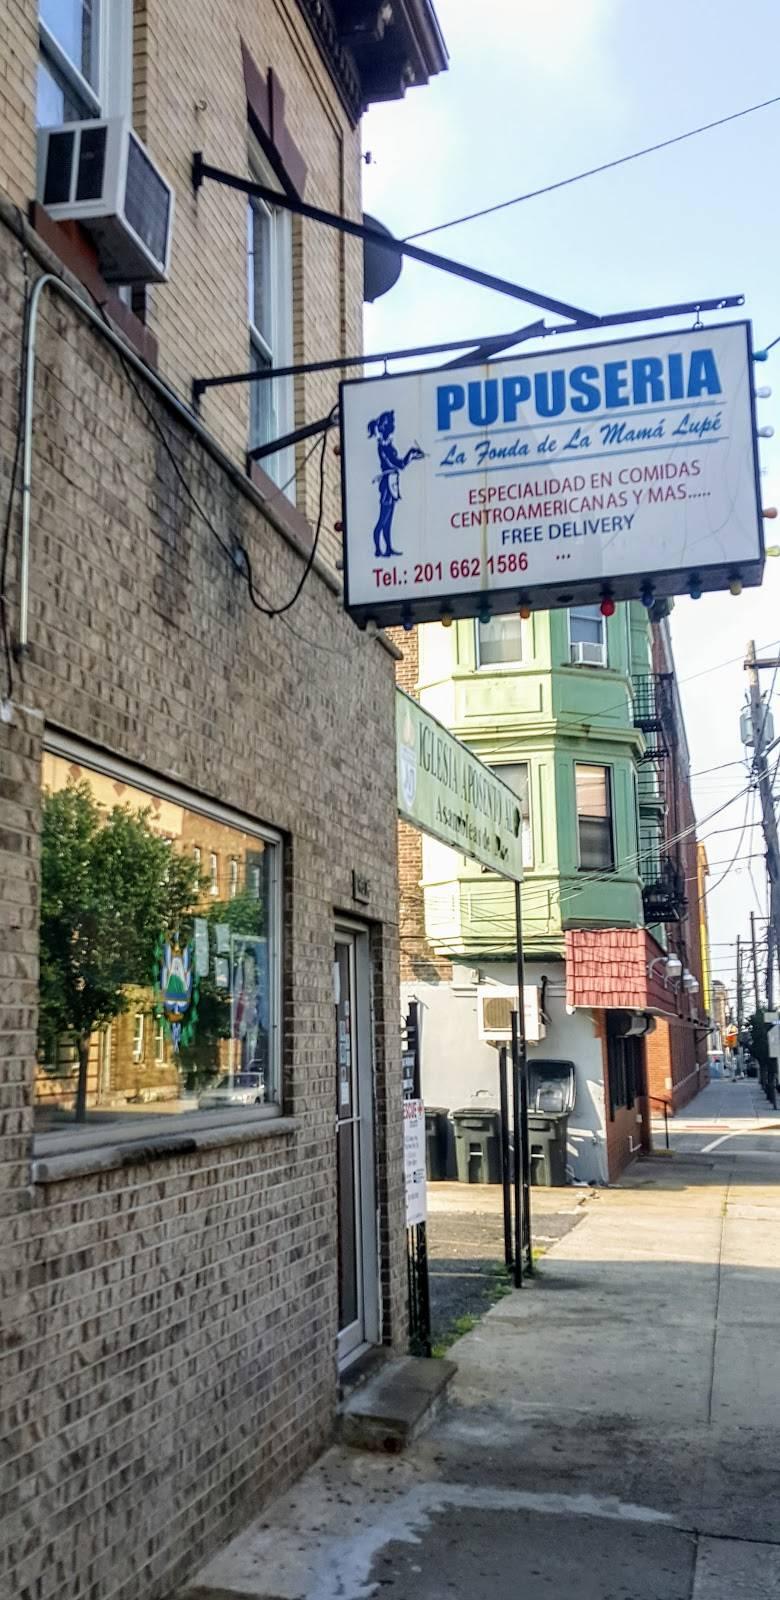 Pupuseria La Fonda De La Mamá Lupé | restaurant | 6306 Hudson Ave, West New York, NJ 07093, USA | 2016621586 OR +1 201-662-1586